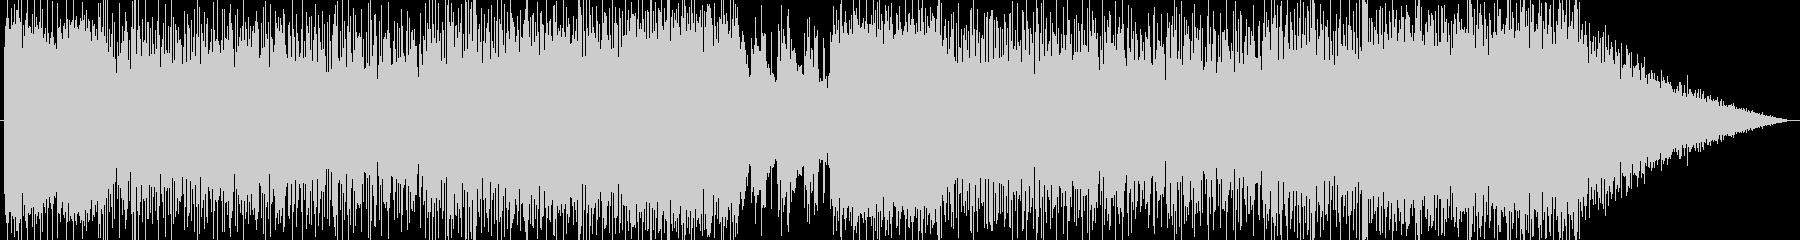 「HR/HM」「DARK」BGM224の未再生の波形